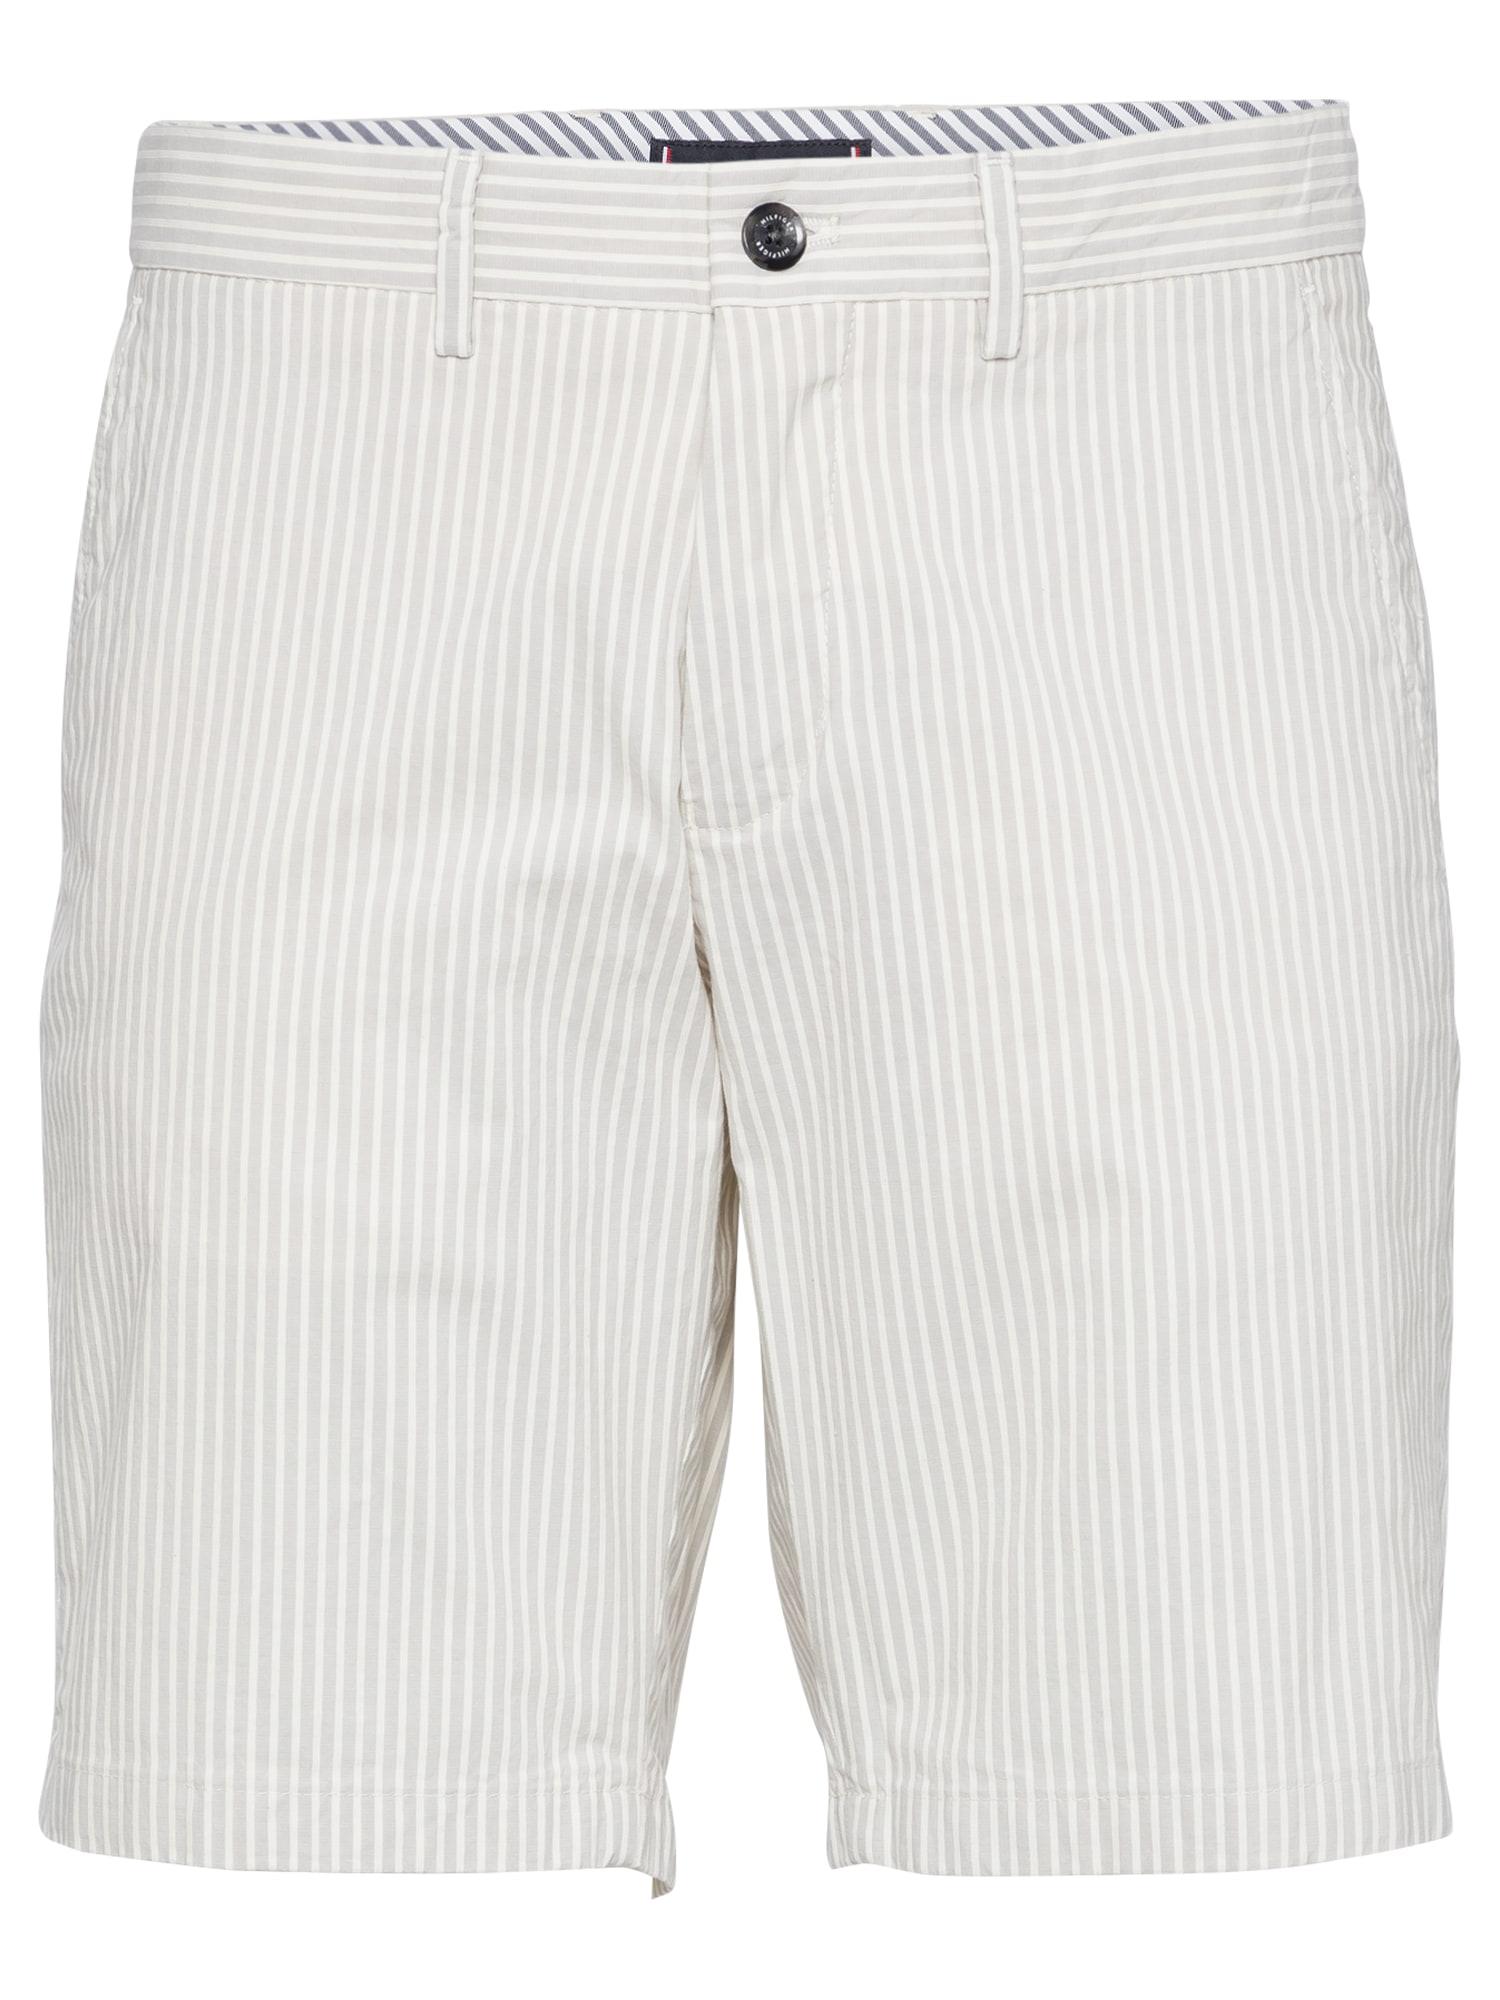 "TOMMY HILFIGER ""Chino"" stiliaus kelnės 'BROOKLYN' šviesiai pilka / balta"